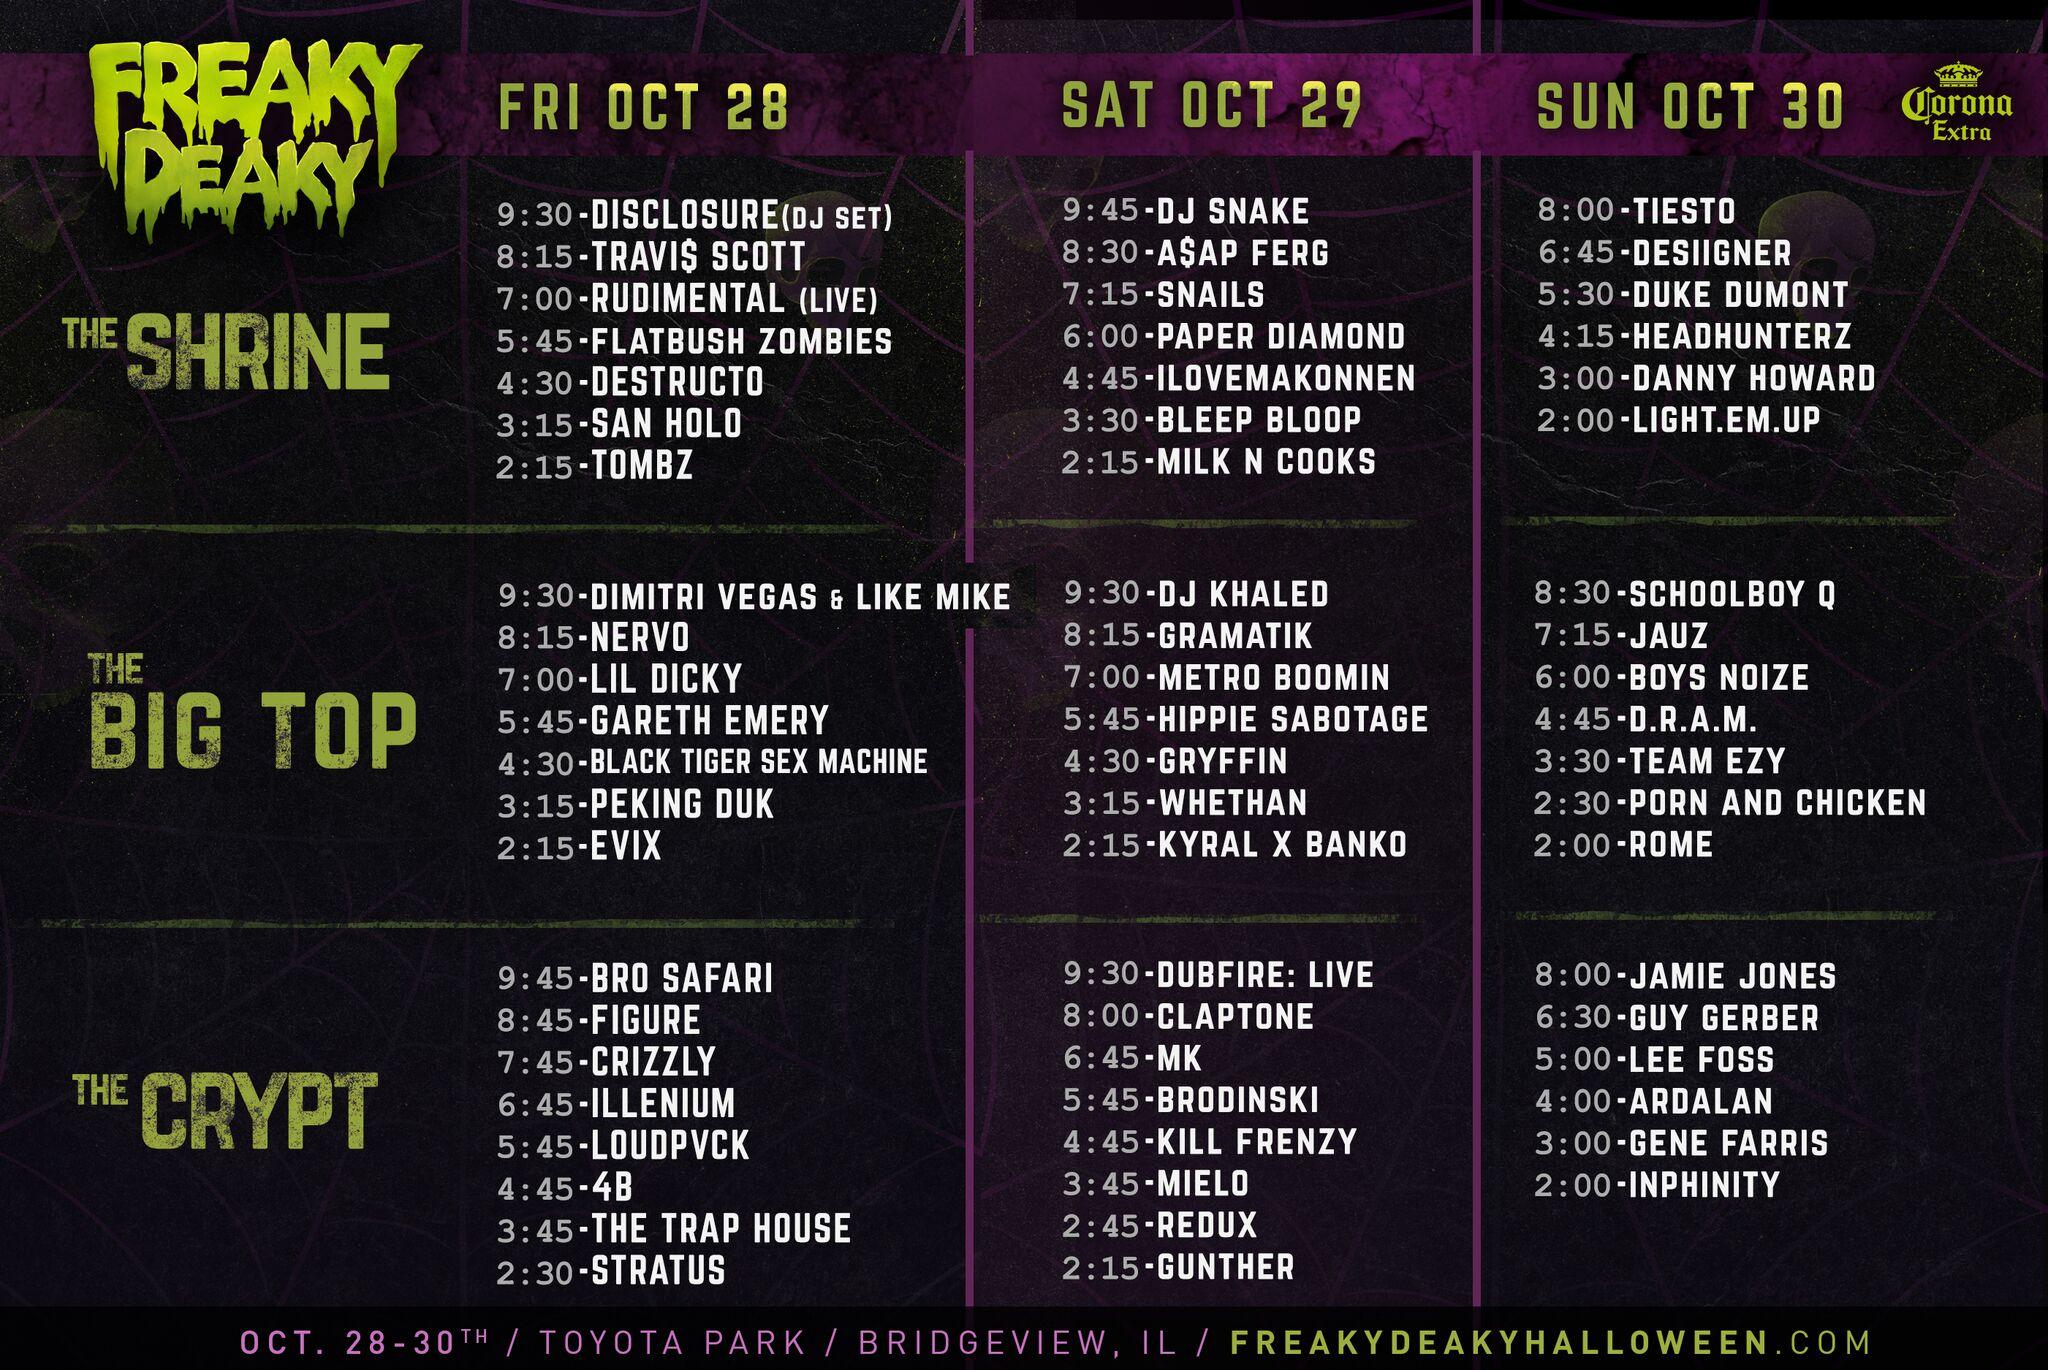 freaky deaky 2016 schedule